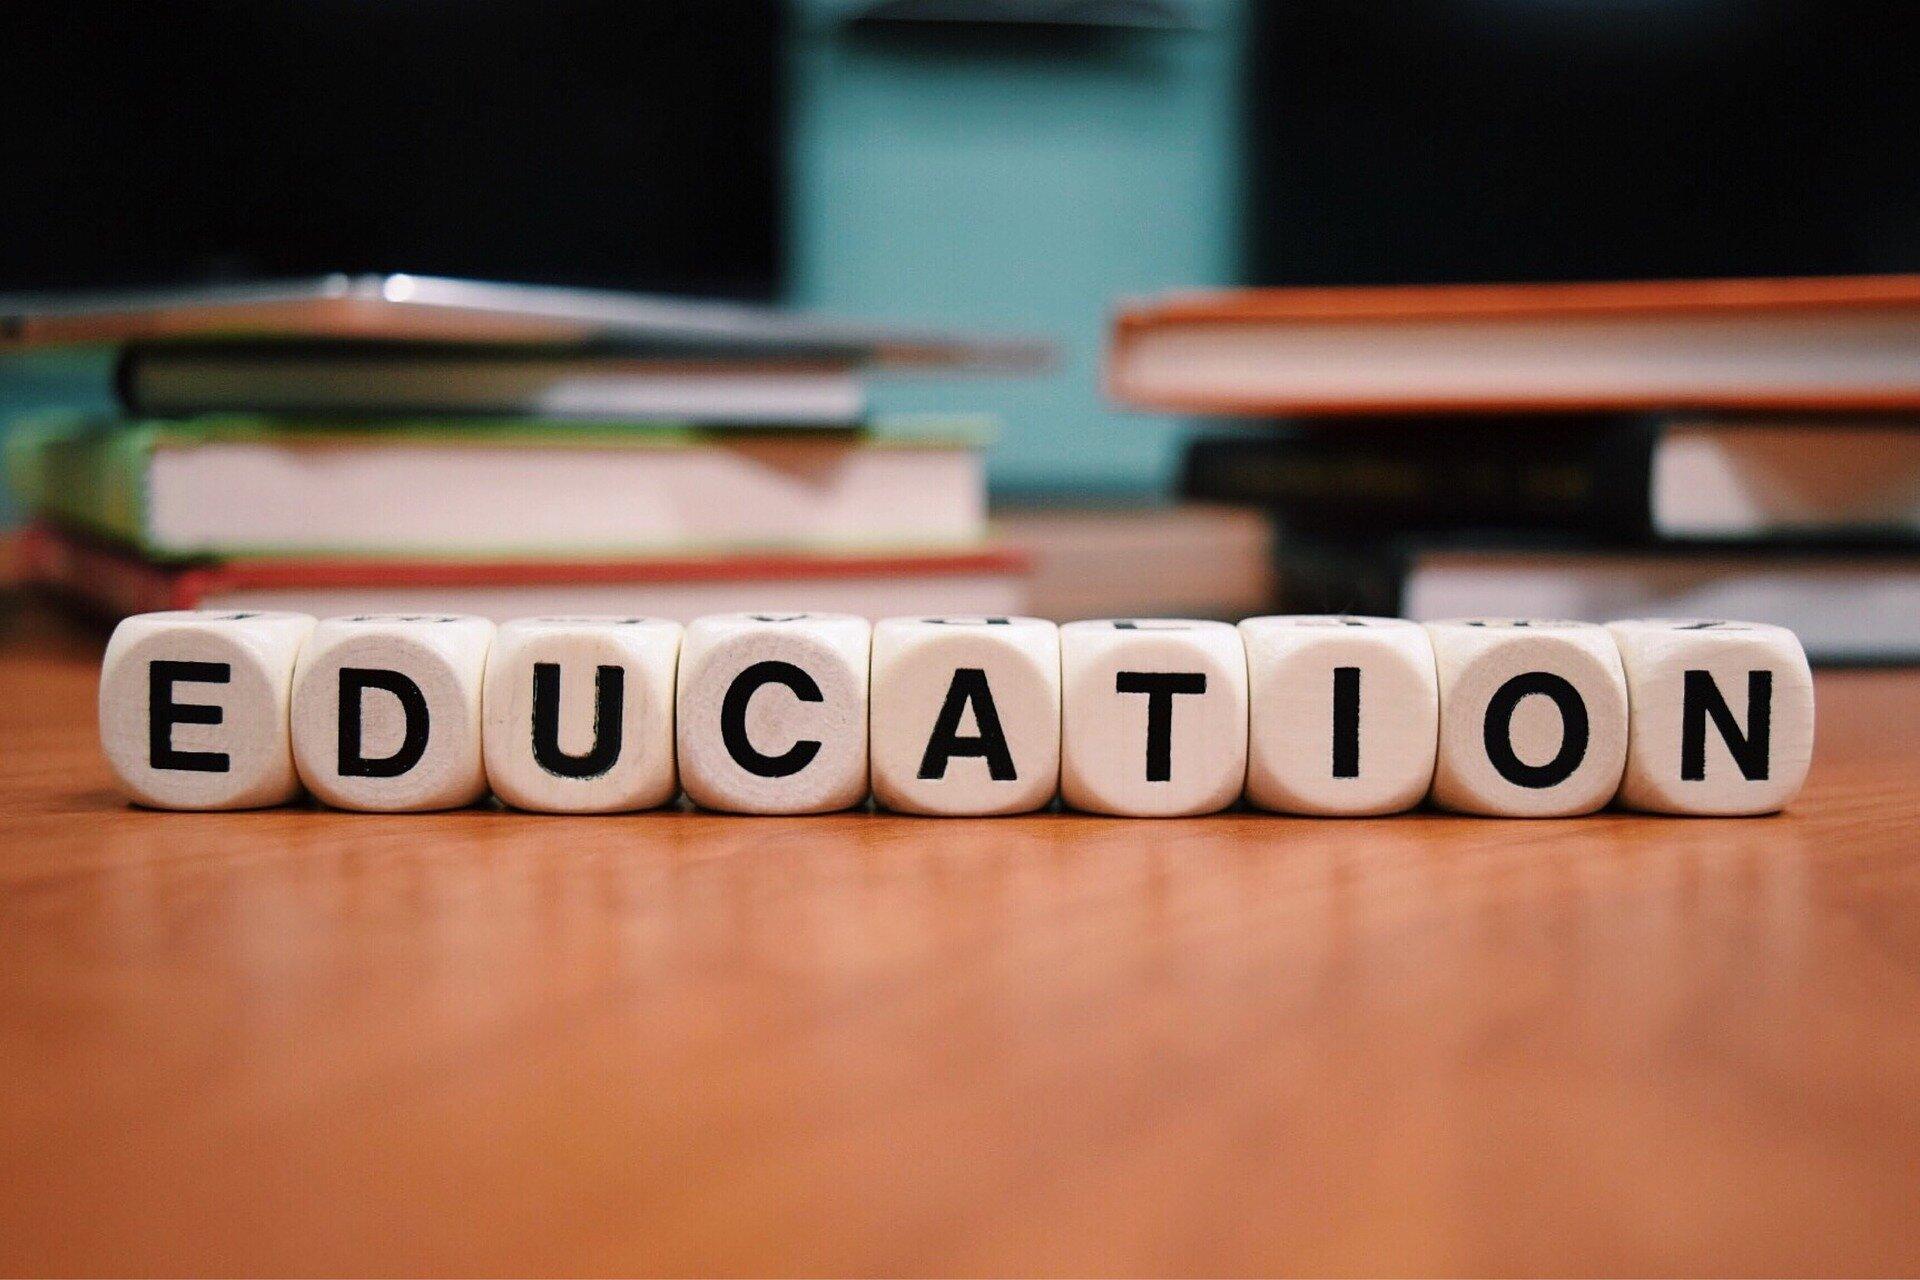 Education-BlockLetters.jpg